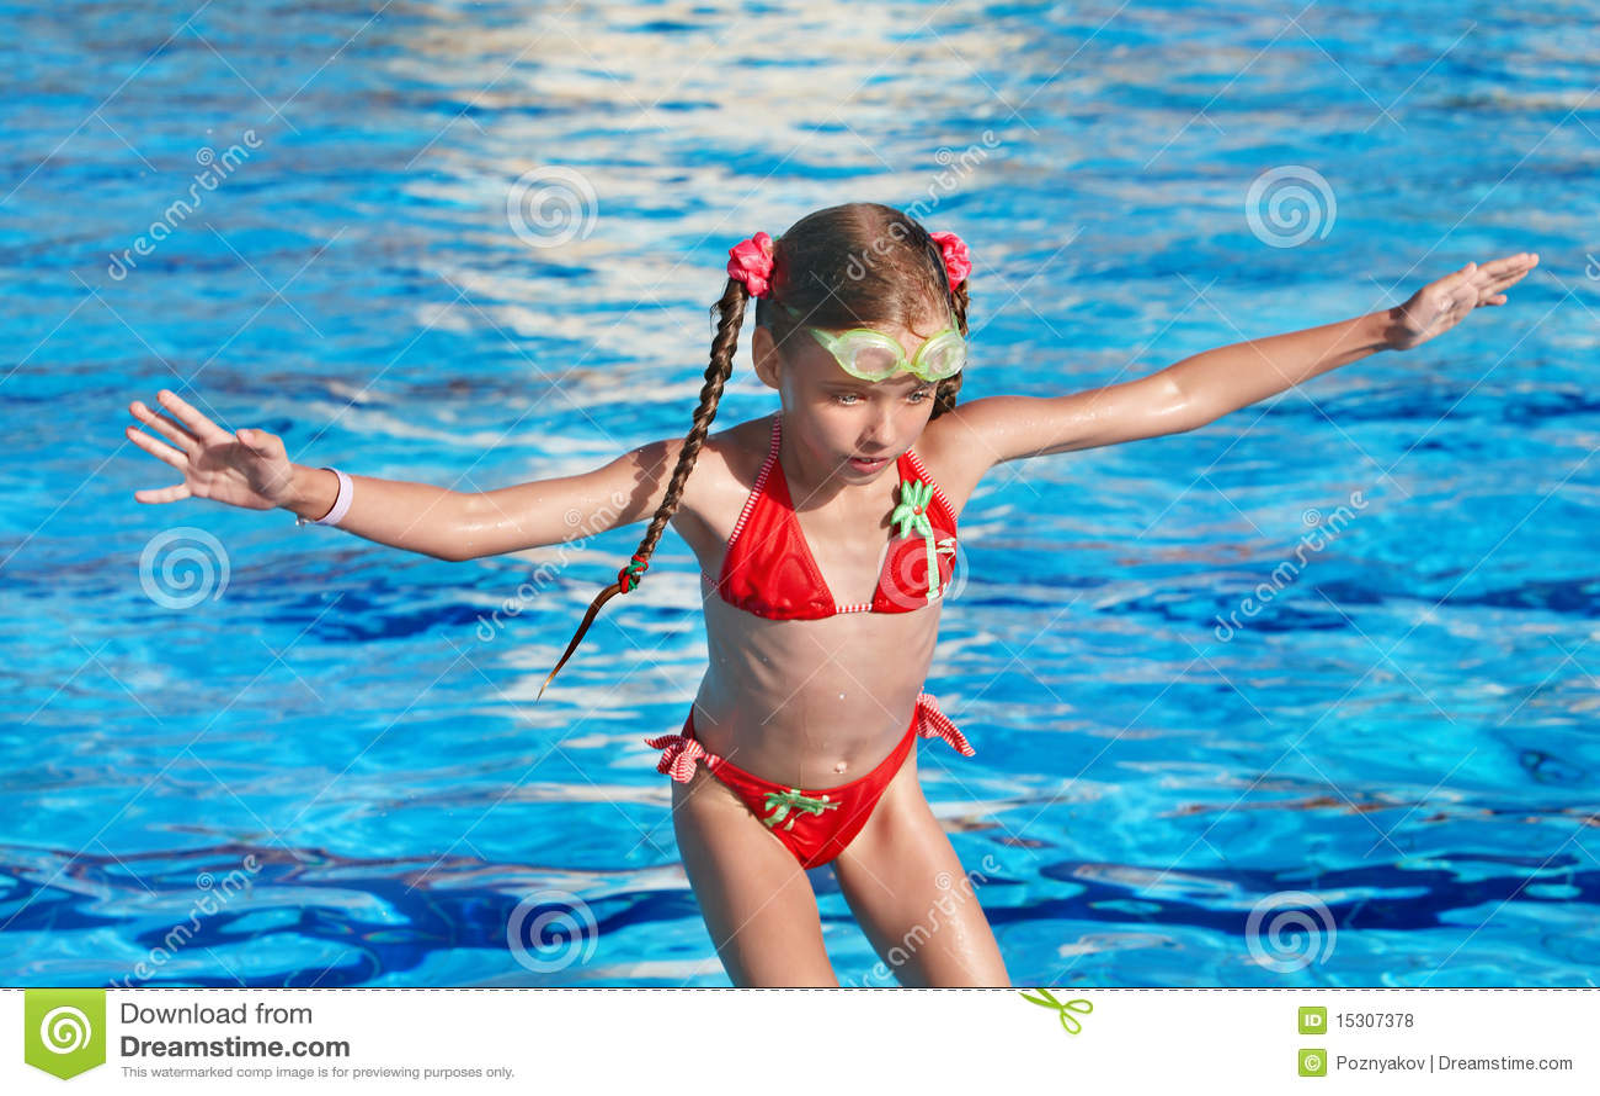 Child Swim In Swimming Pool Royalty Free Stock Photos Image